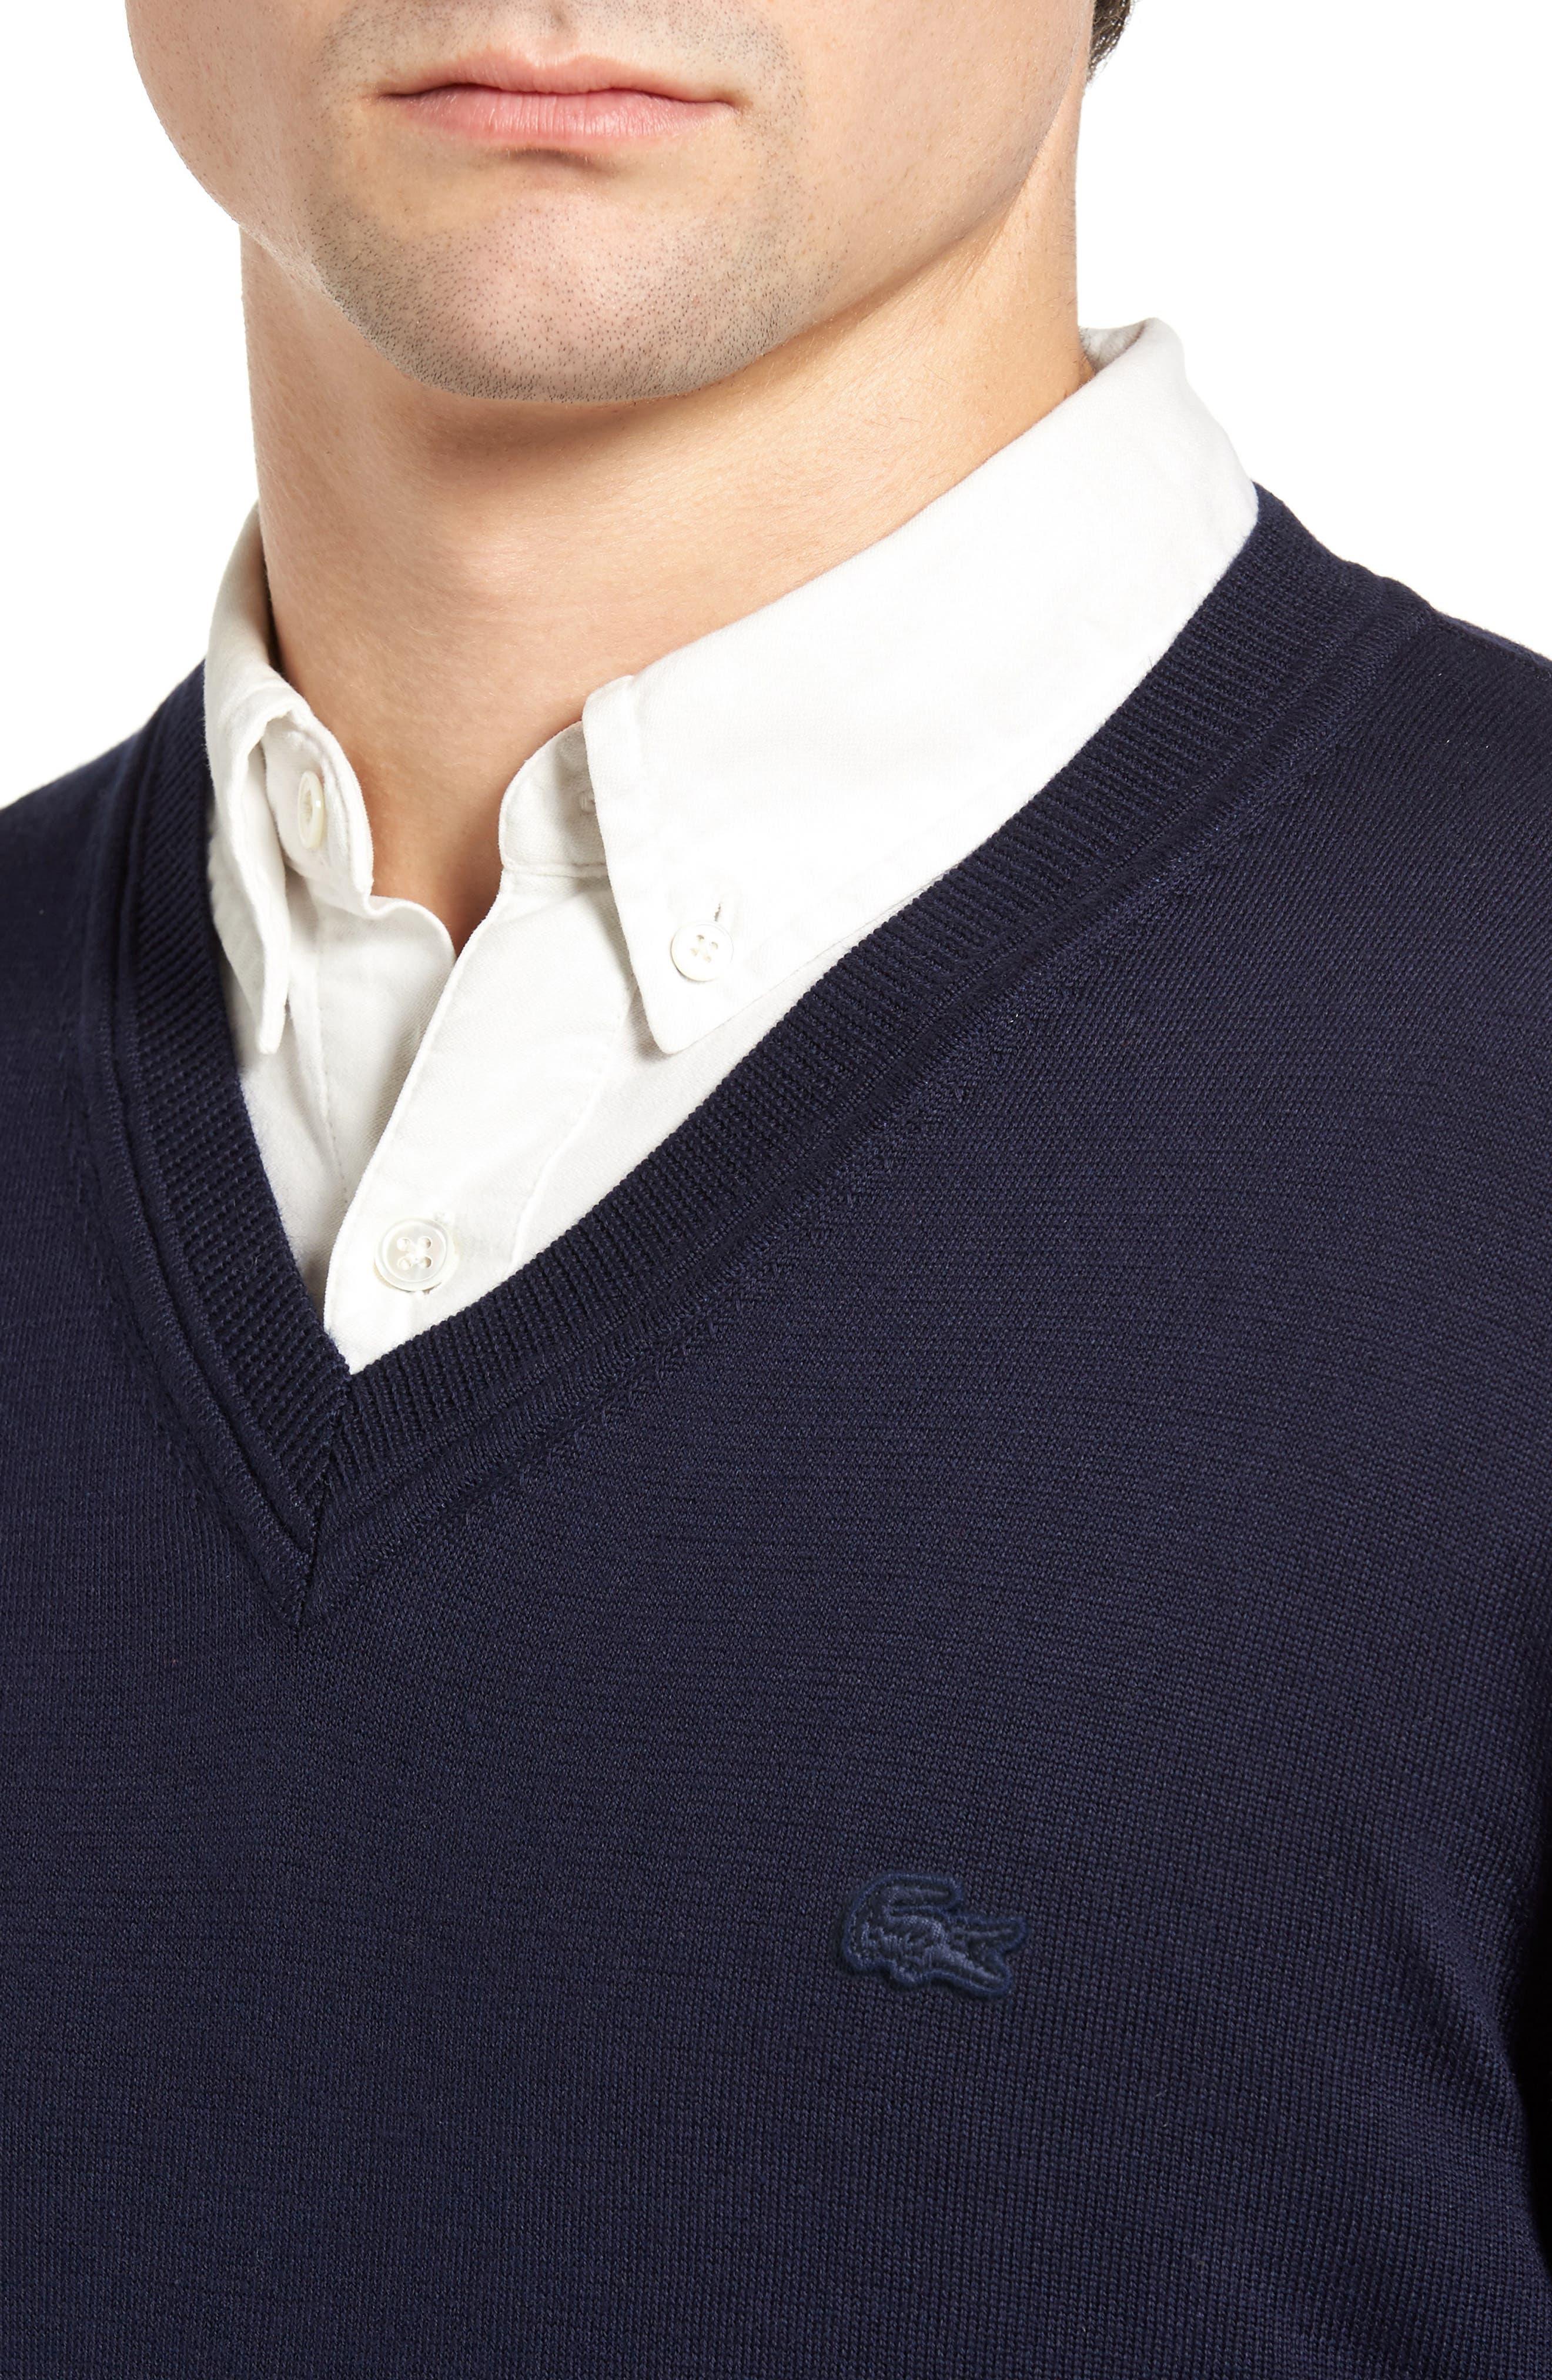 Cotton Jersey V-Neck Sweater,                             Alternate thumbnail 11, color,